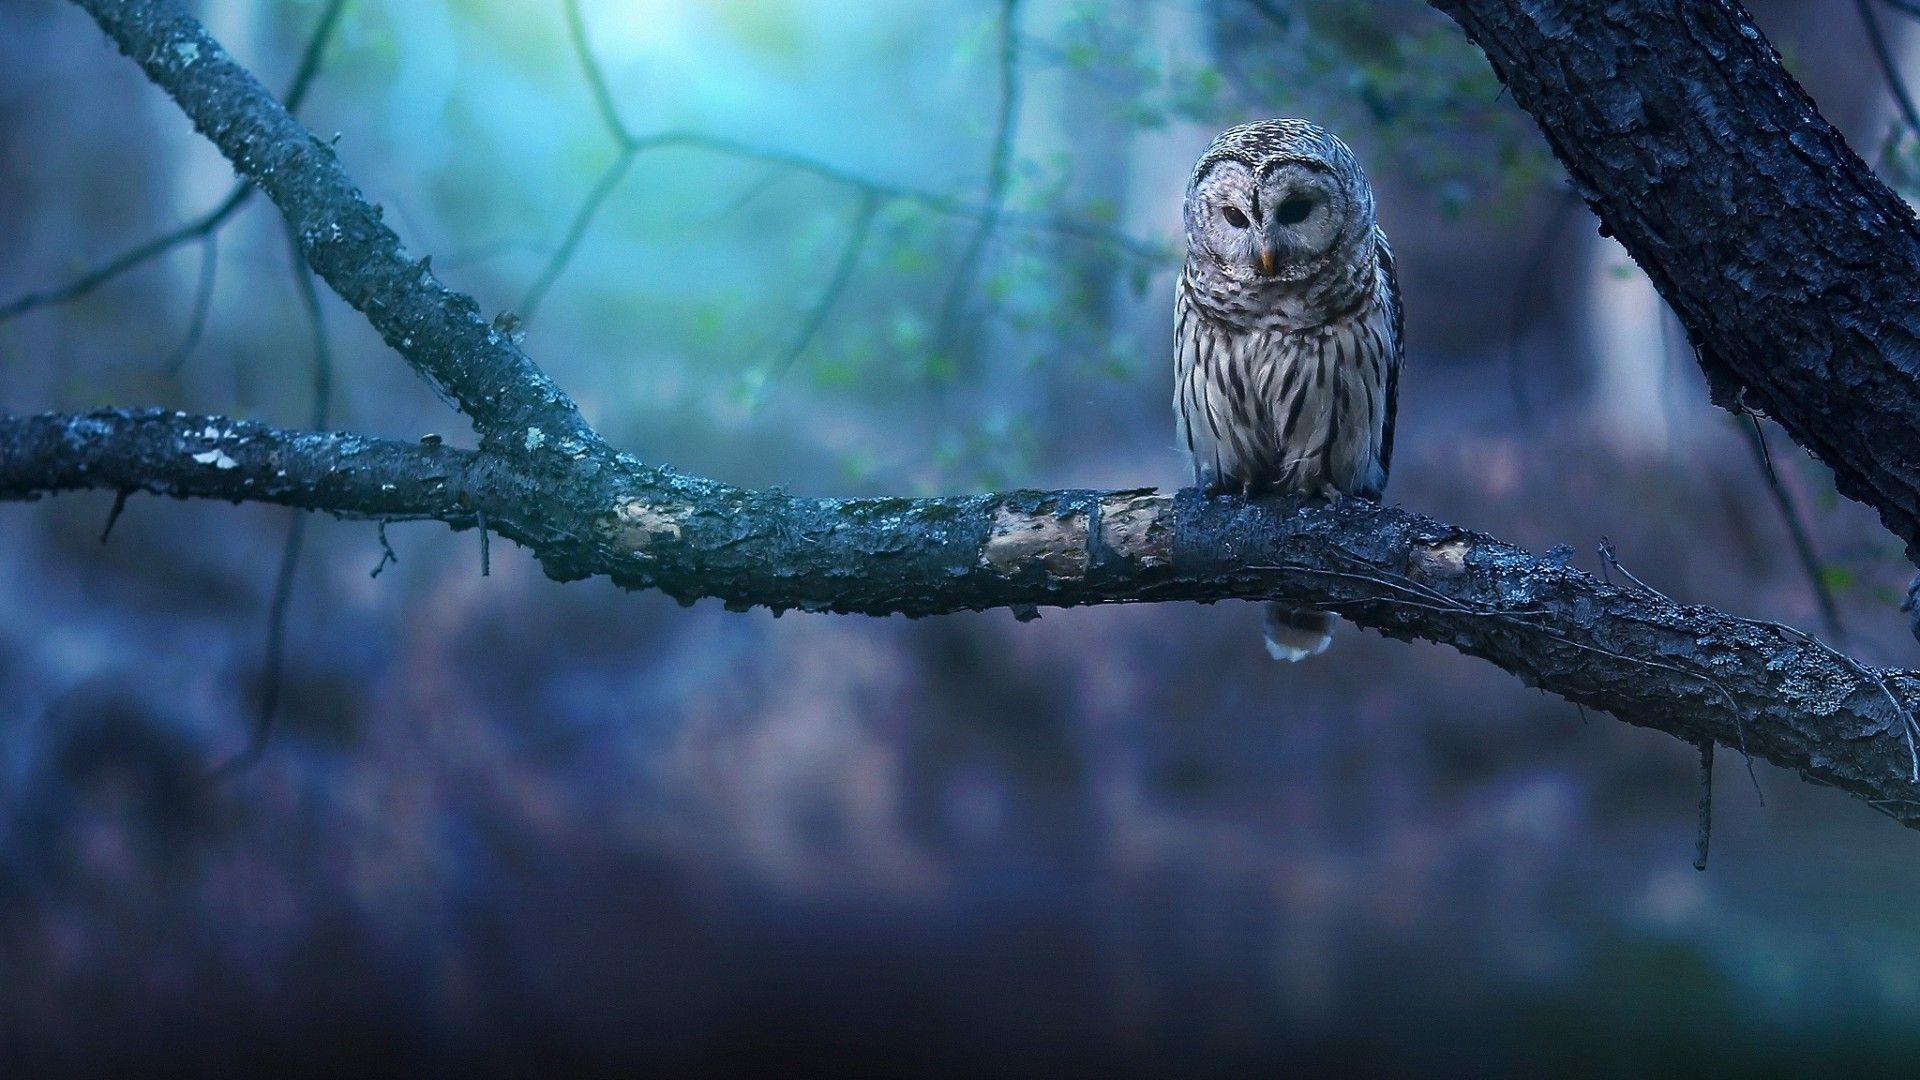 Owls 4k